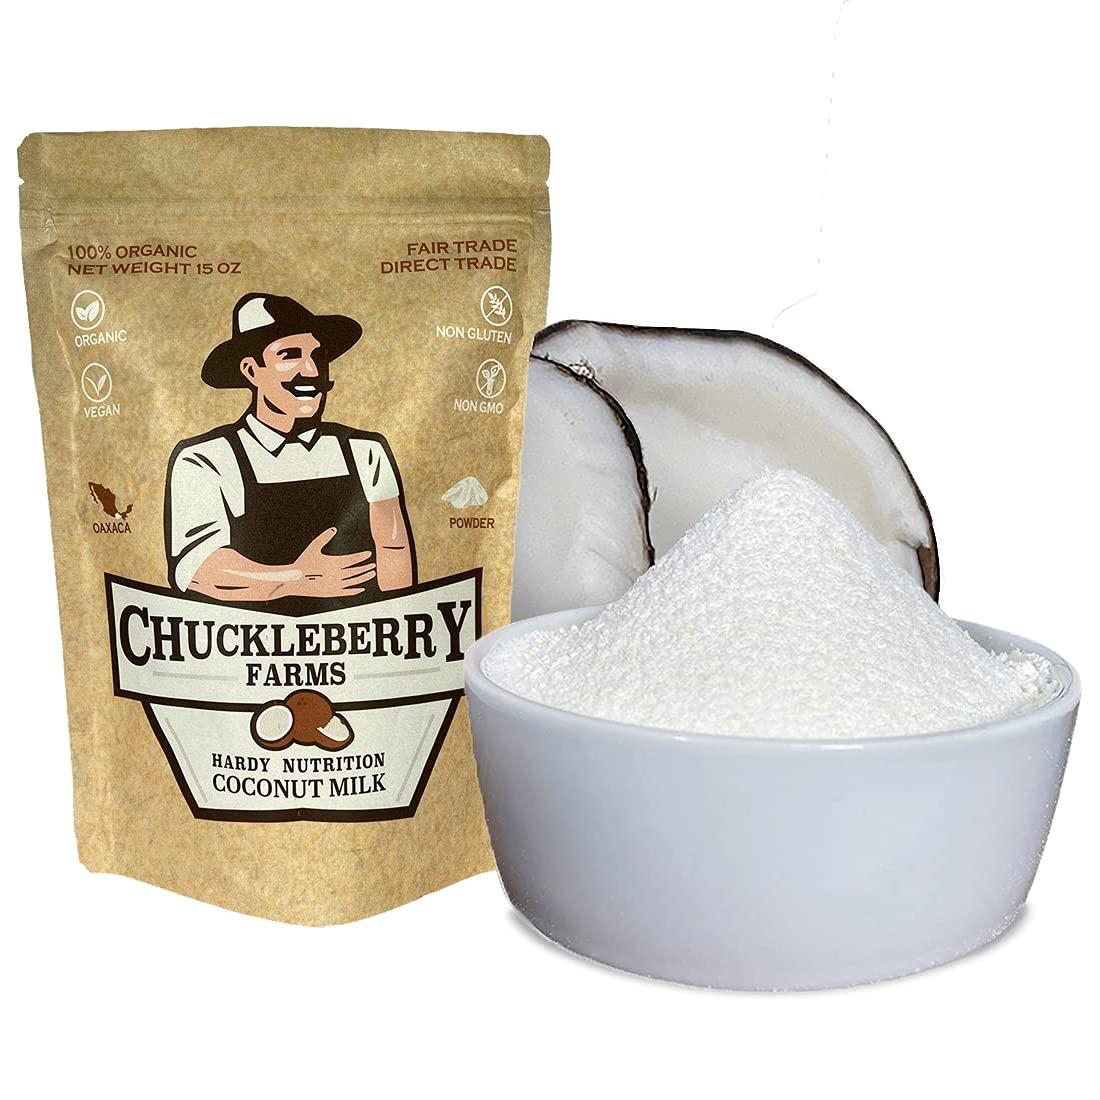 Chuckleberry Farms Organic Coconut Milk – New product!! All San Jose Mall Powder Natur